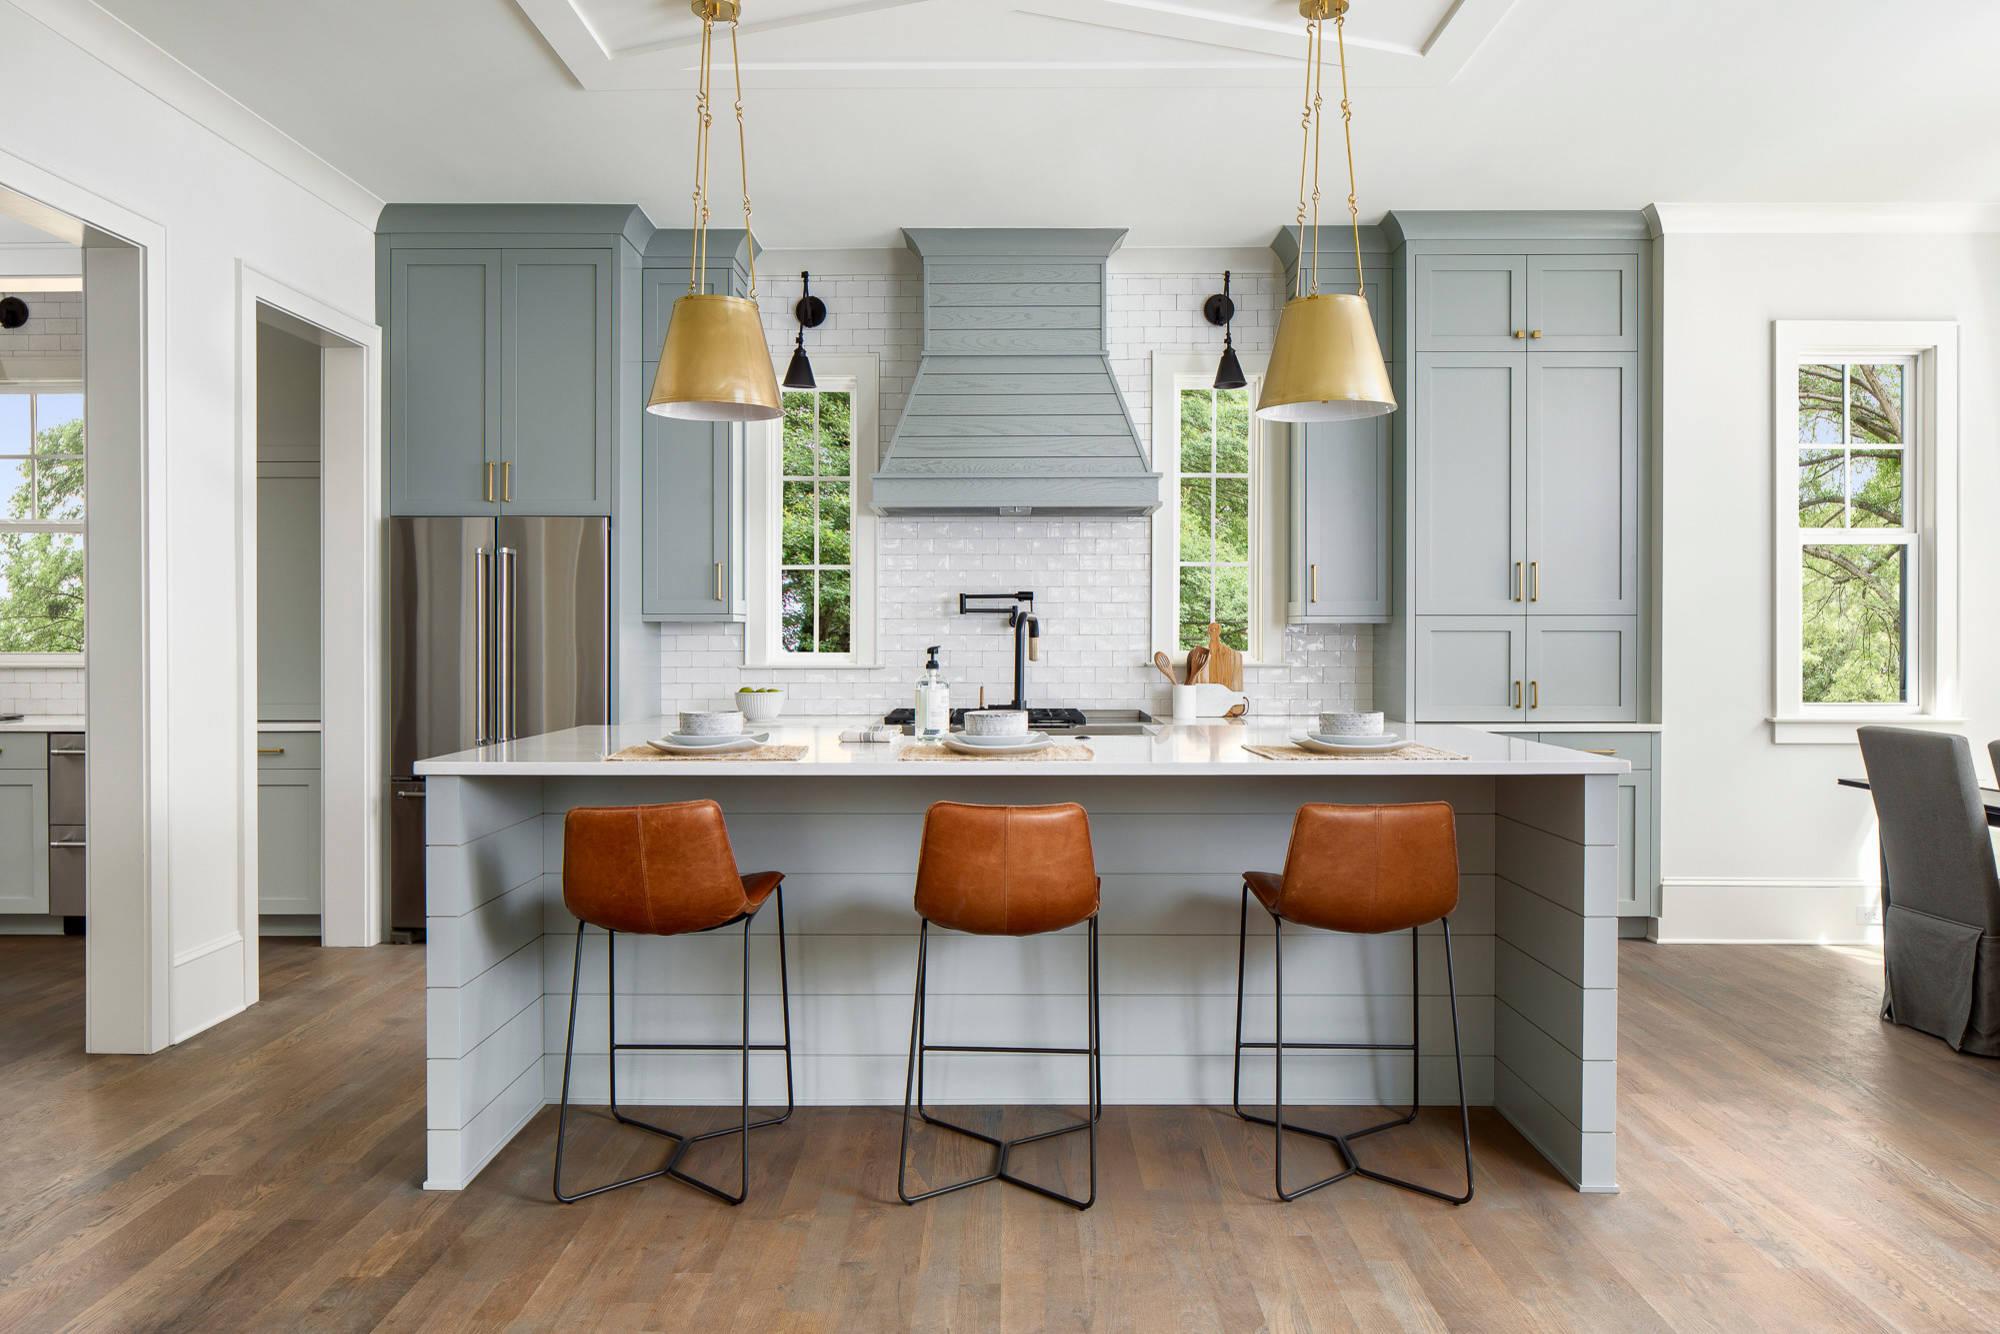 Kitchen Windows As A Storage Space